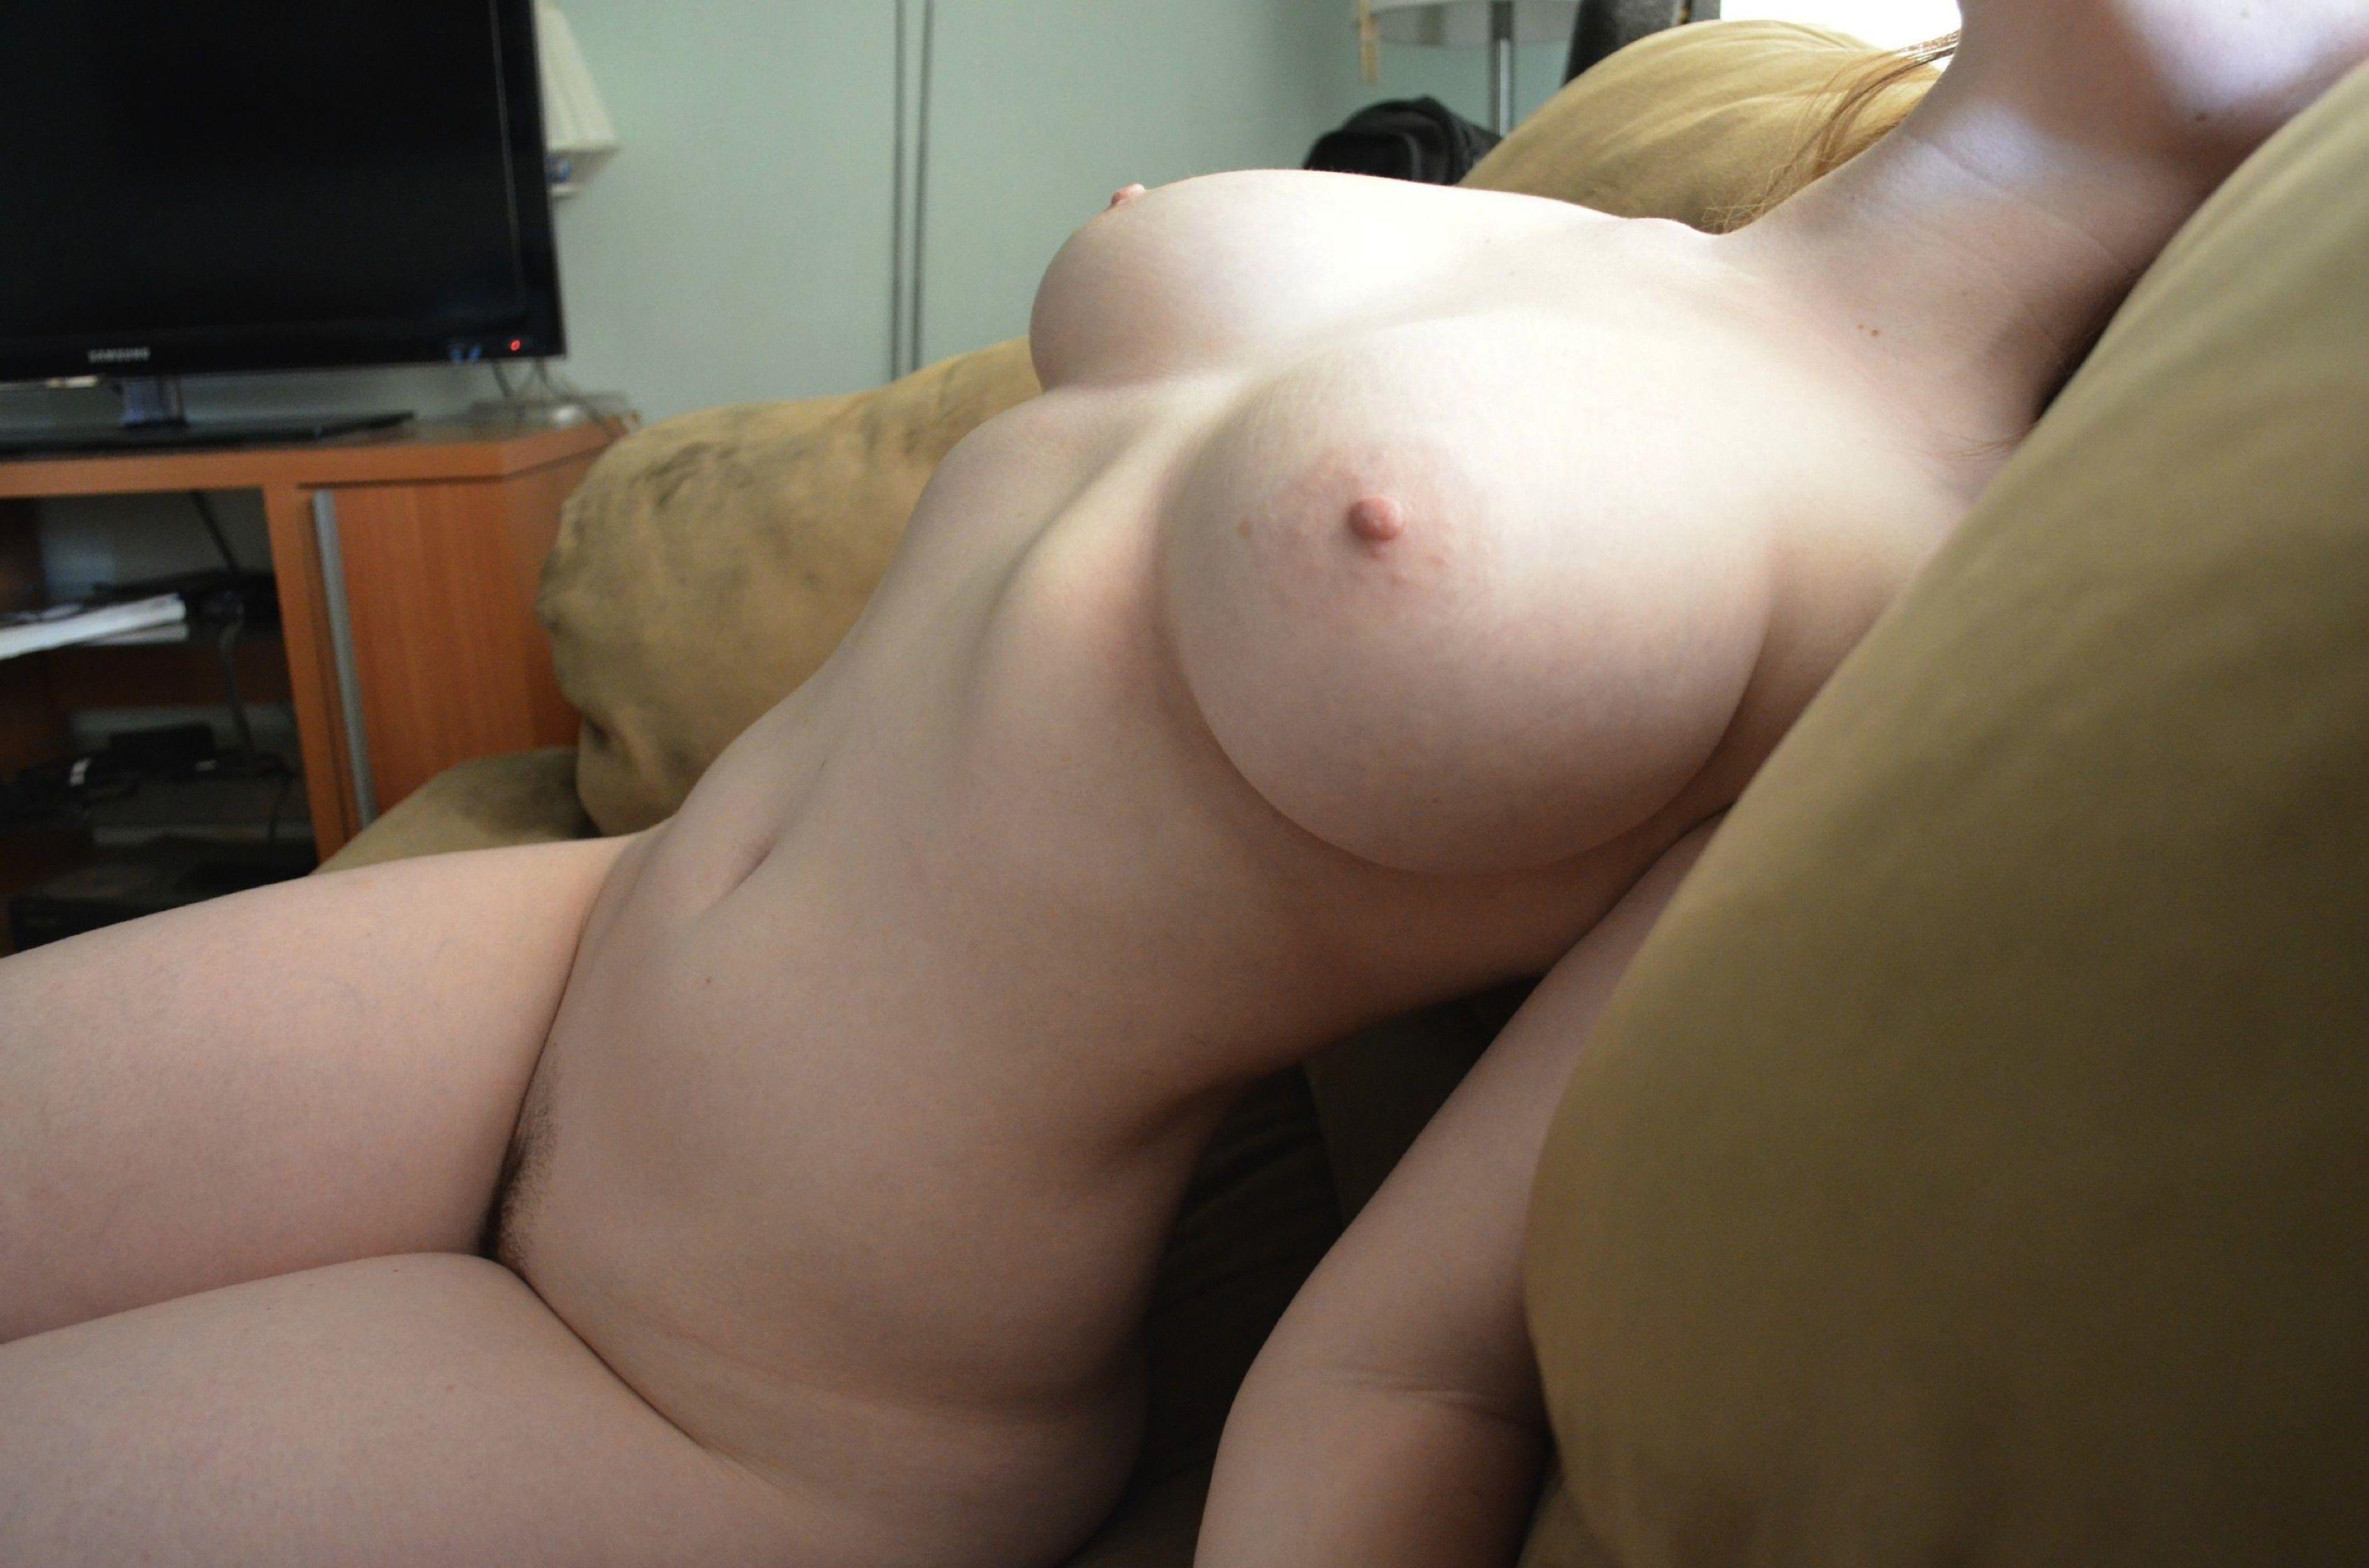 Фото голих дівчат крупним планом 3 фотография